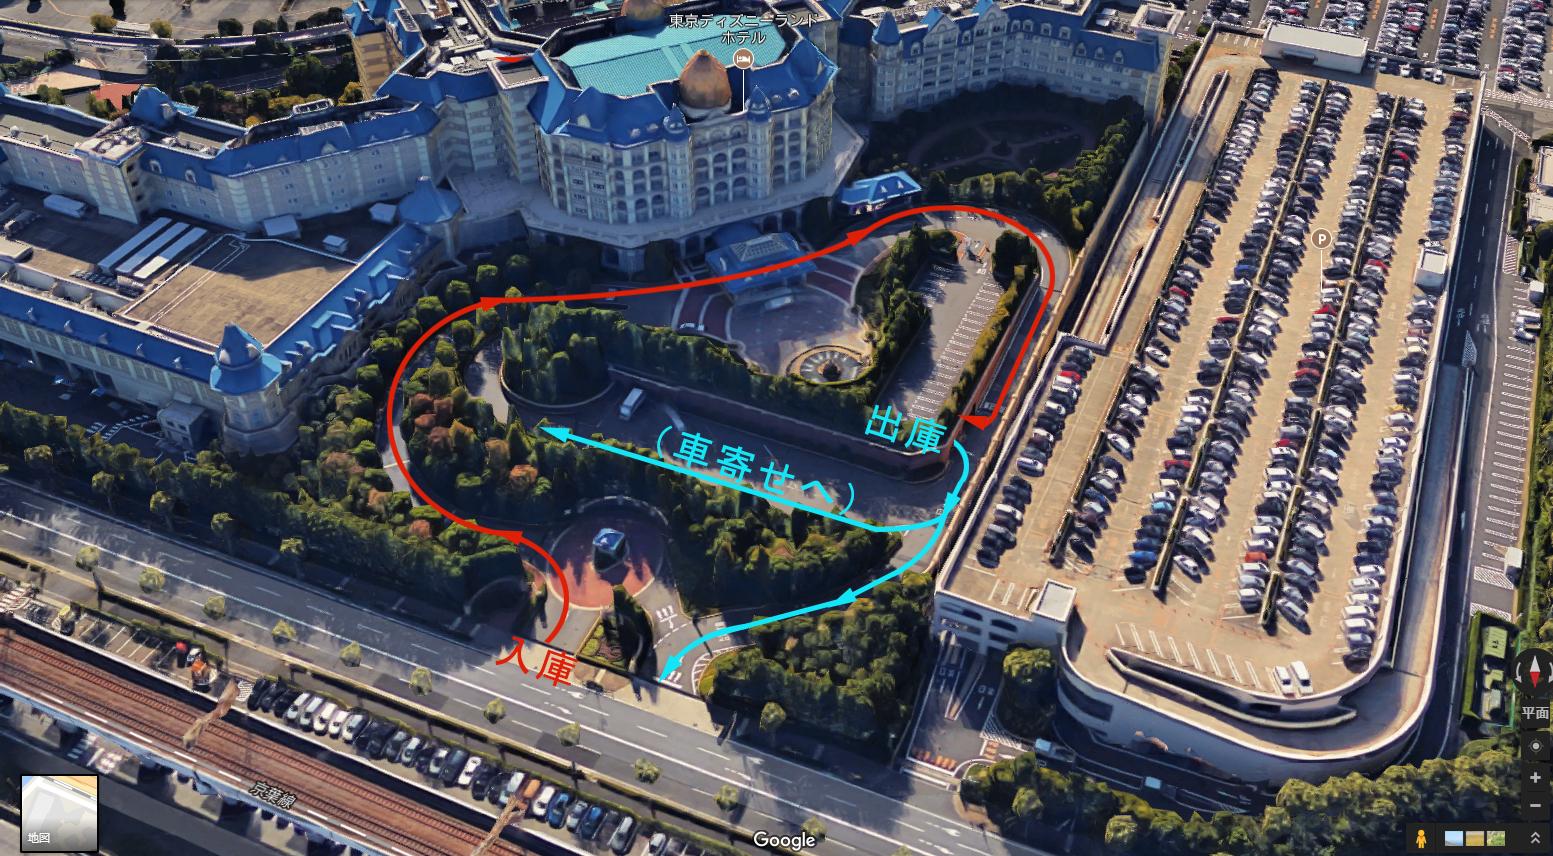 lambda の徒然日記 東京ディズニーランドホテル宿泊者専用駐車場入出庫